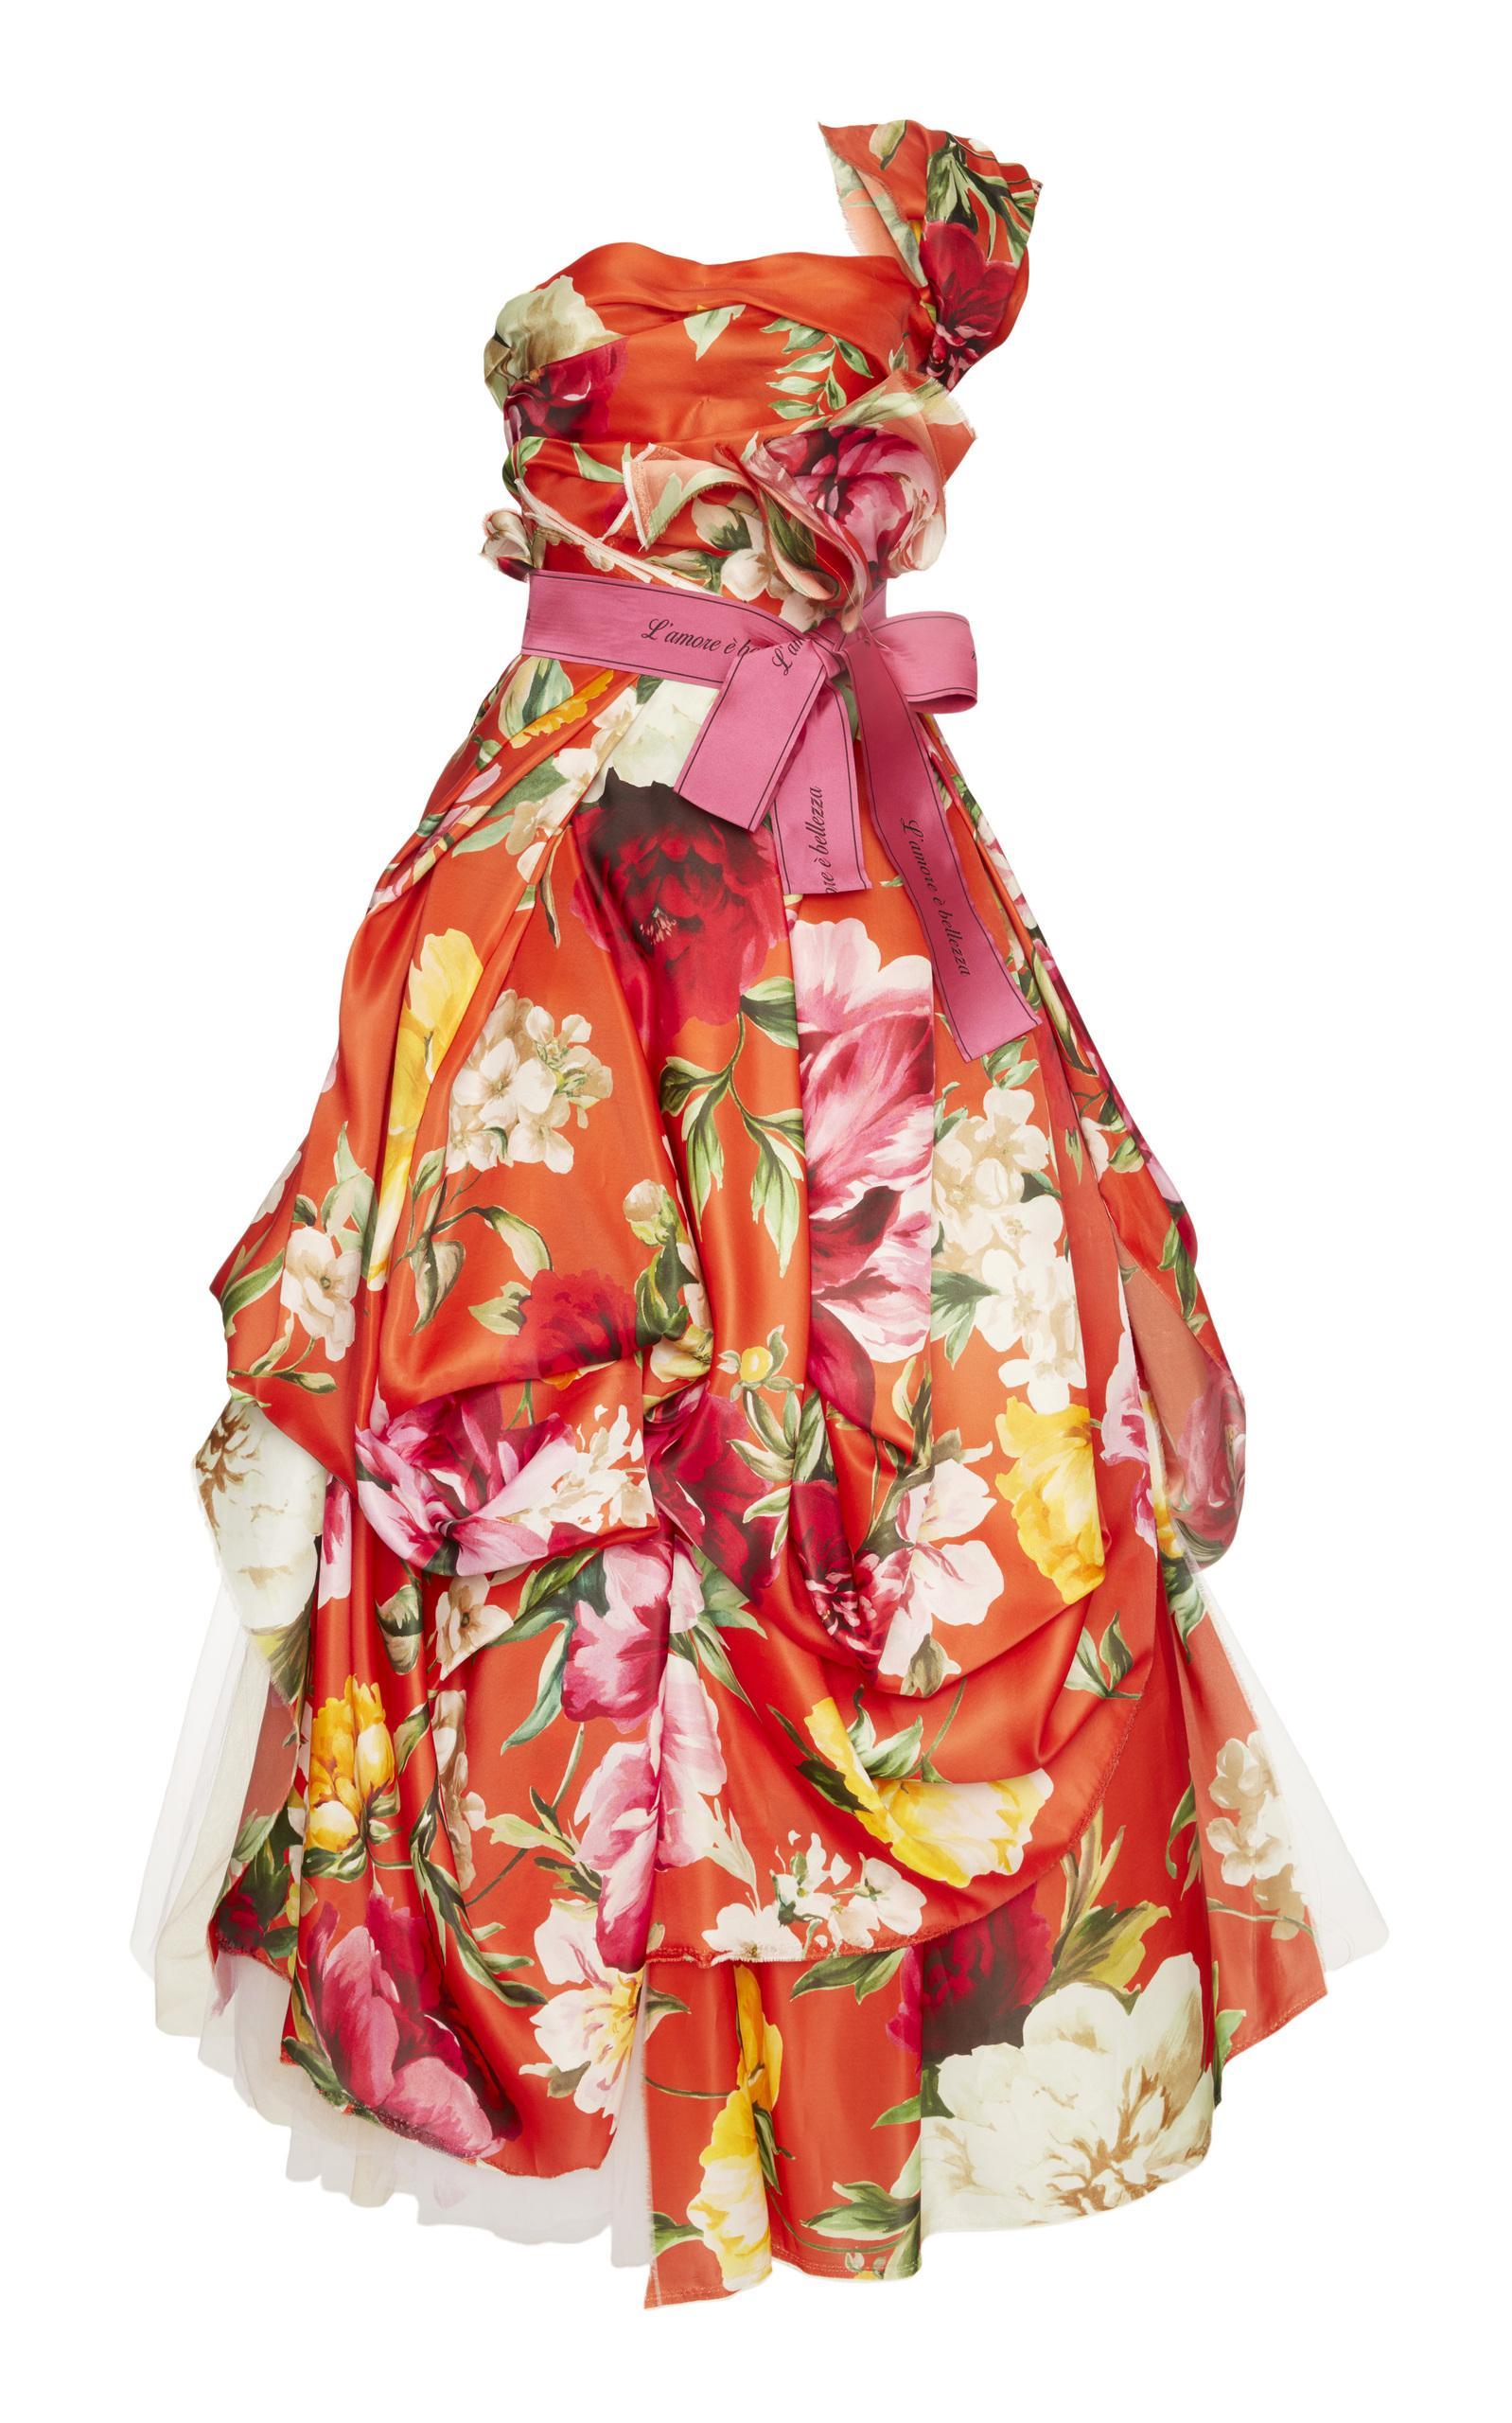 Dolce & Gabbana Off The Shoulder Floral Gown